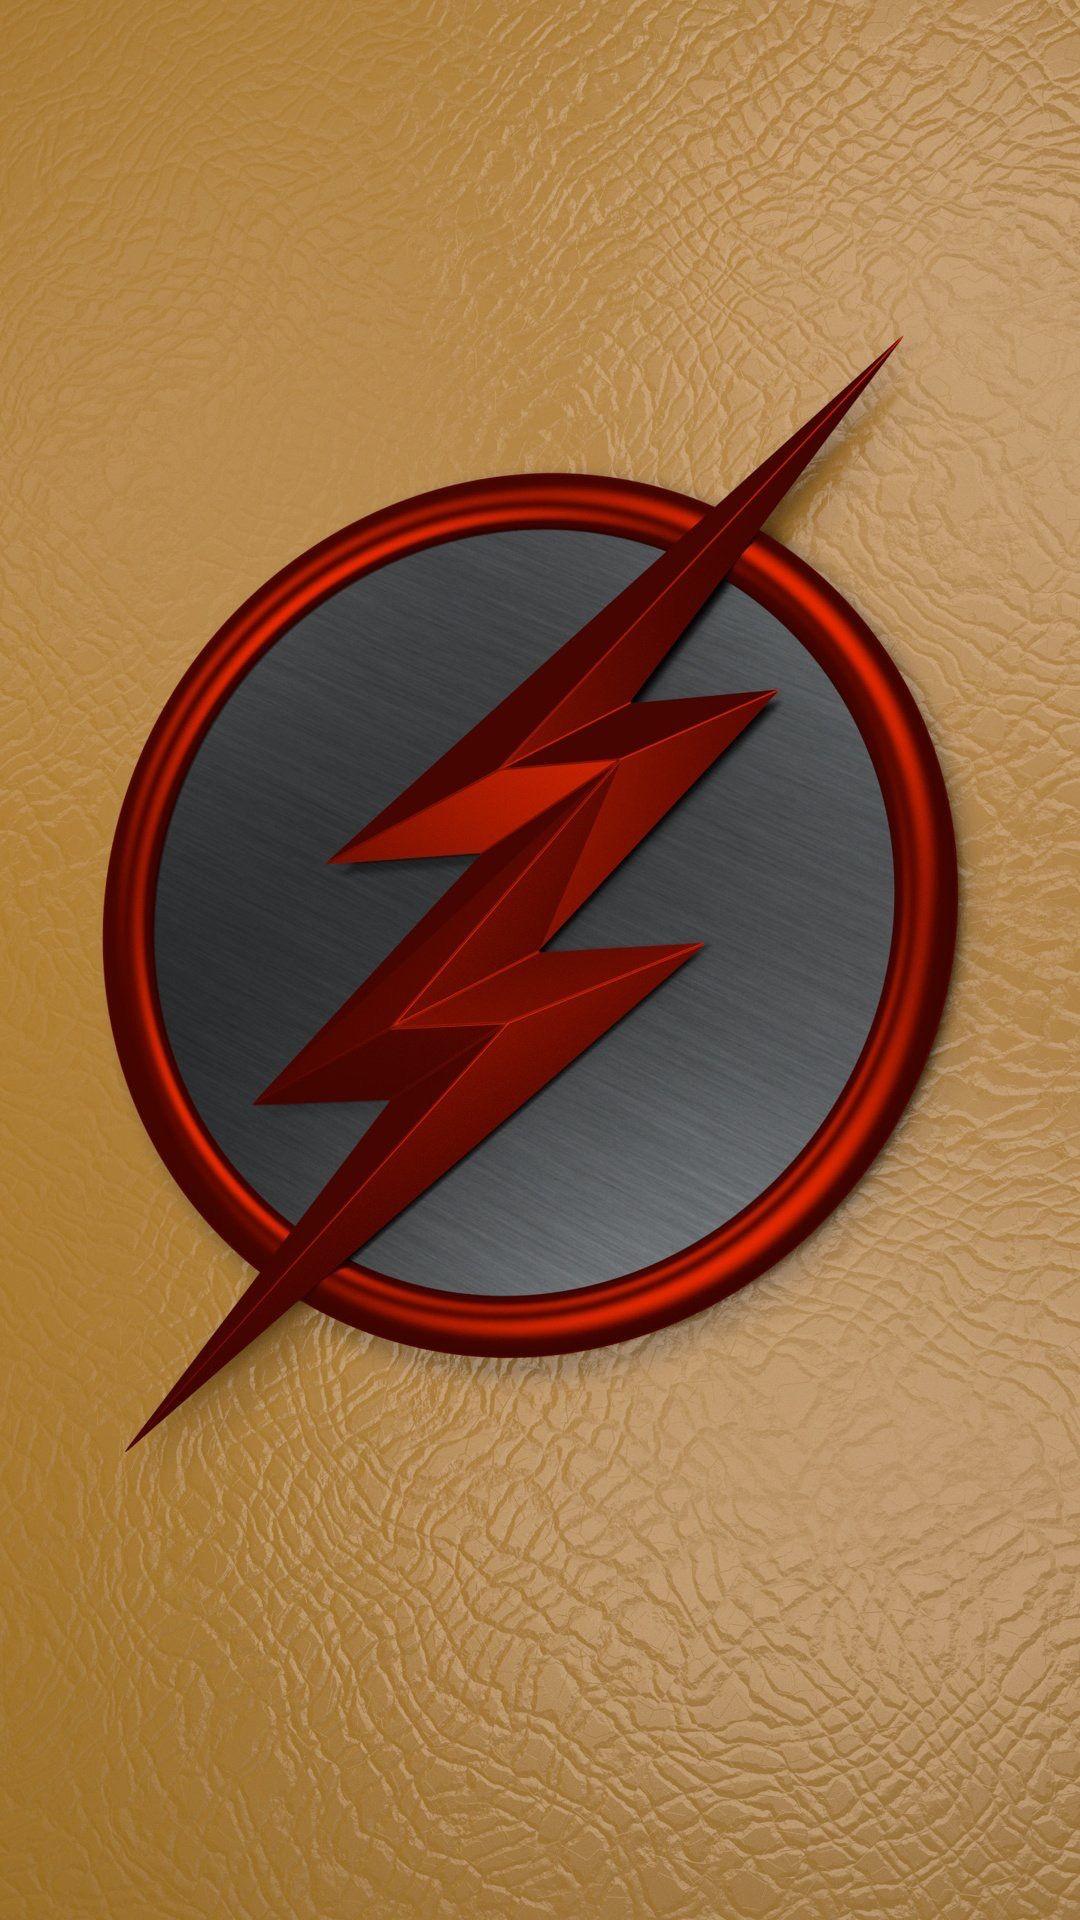 Kid Flash Background Flash Wallpaper The Flash Zoom The Flash